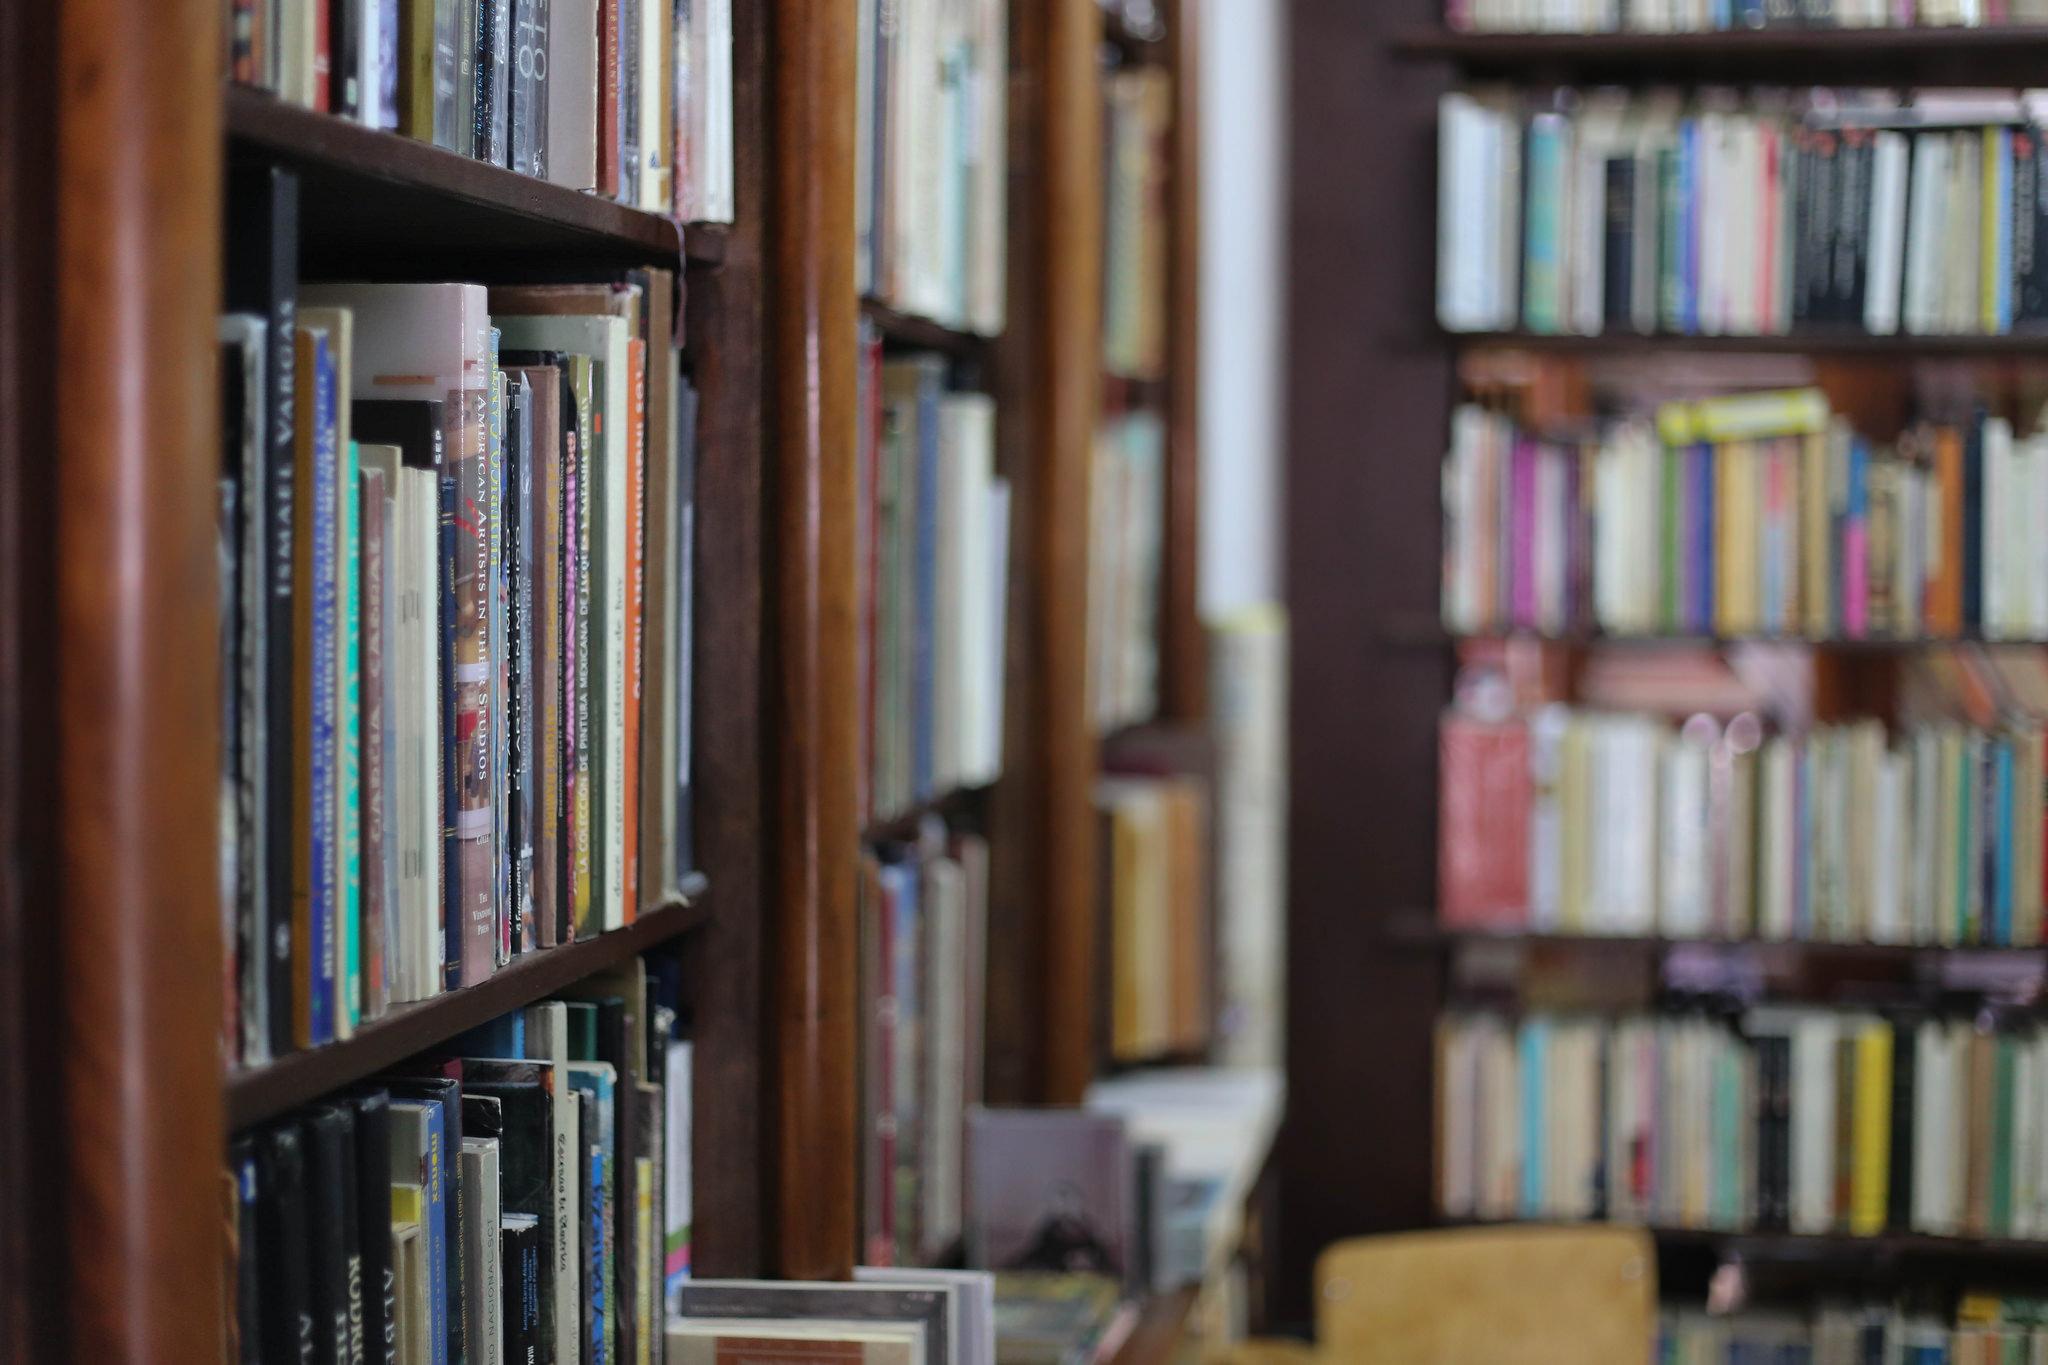 Shelves | © Paul Sableman/Flickr